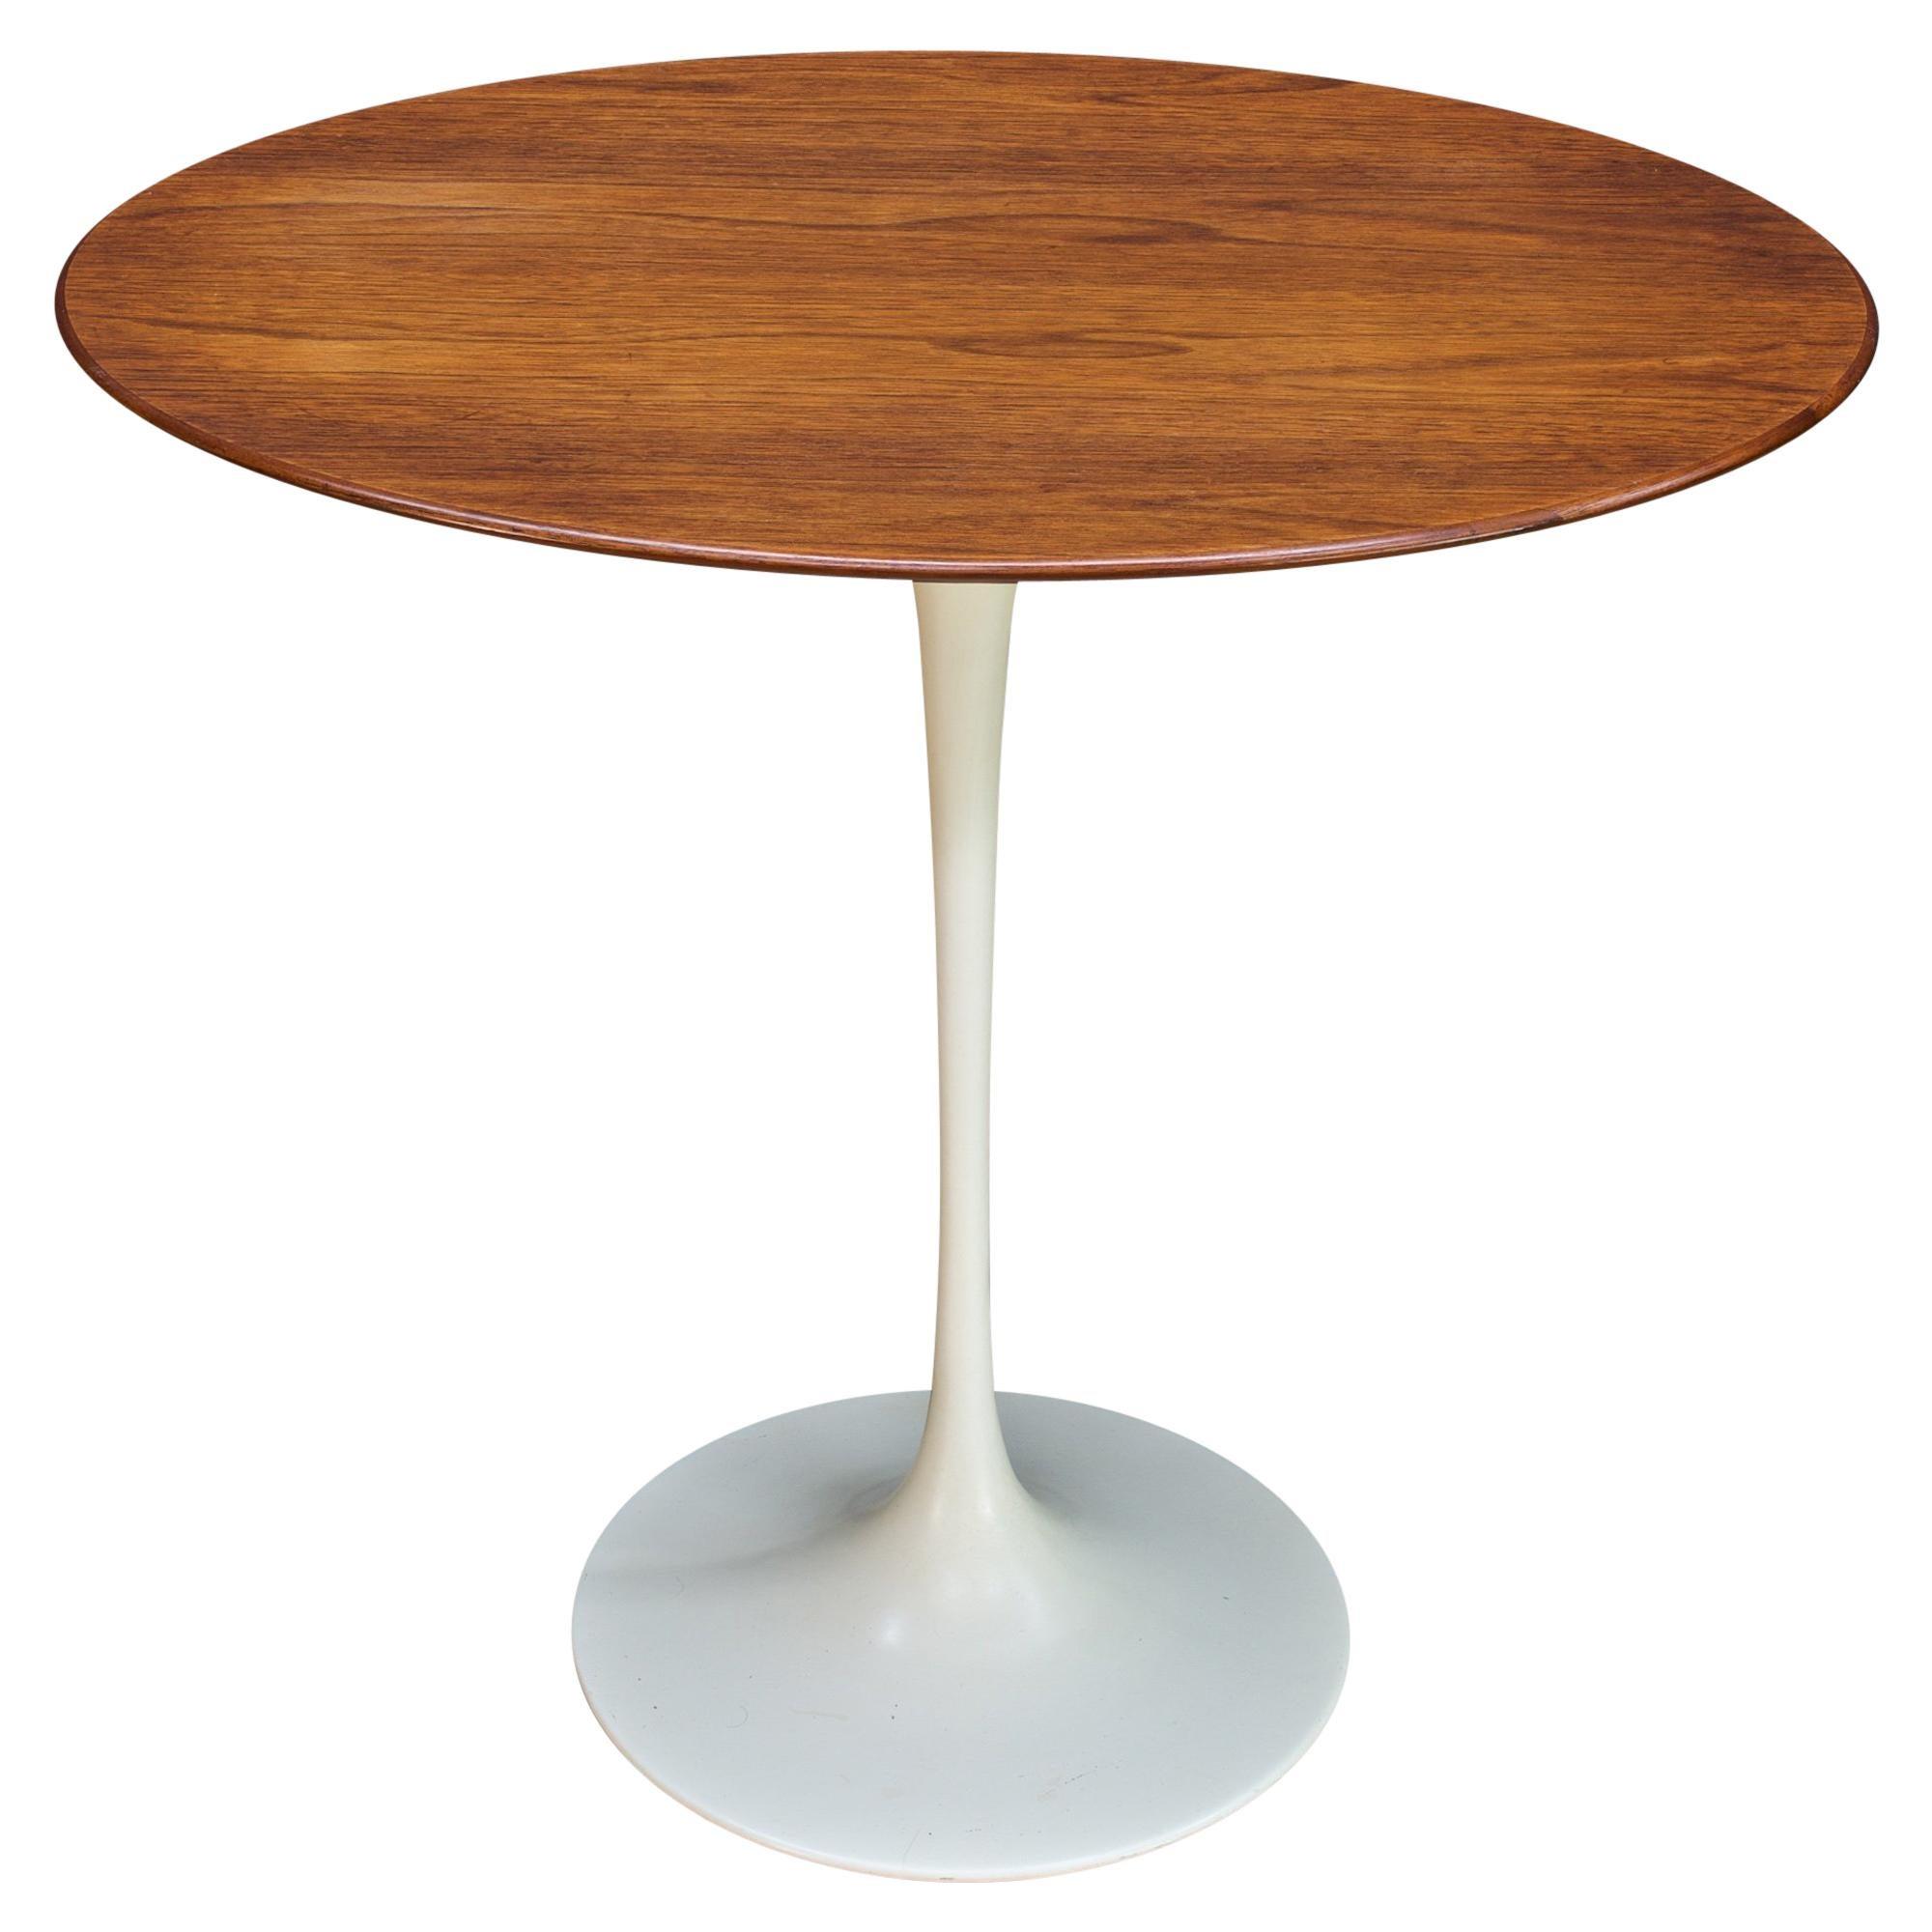 1960s CabinModern Oval Walnut Tulip Side Table Eero Saarinen Knoll Elliptical